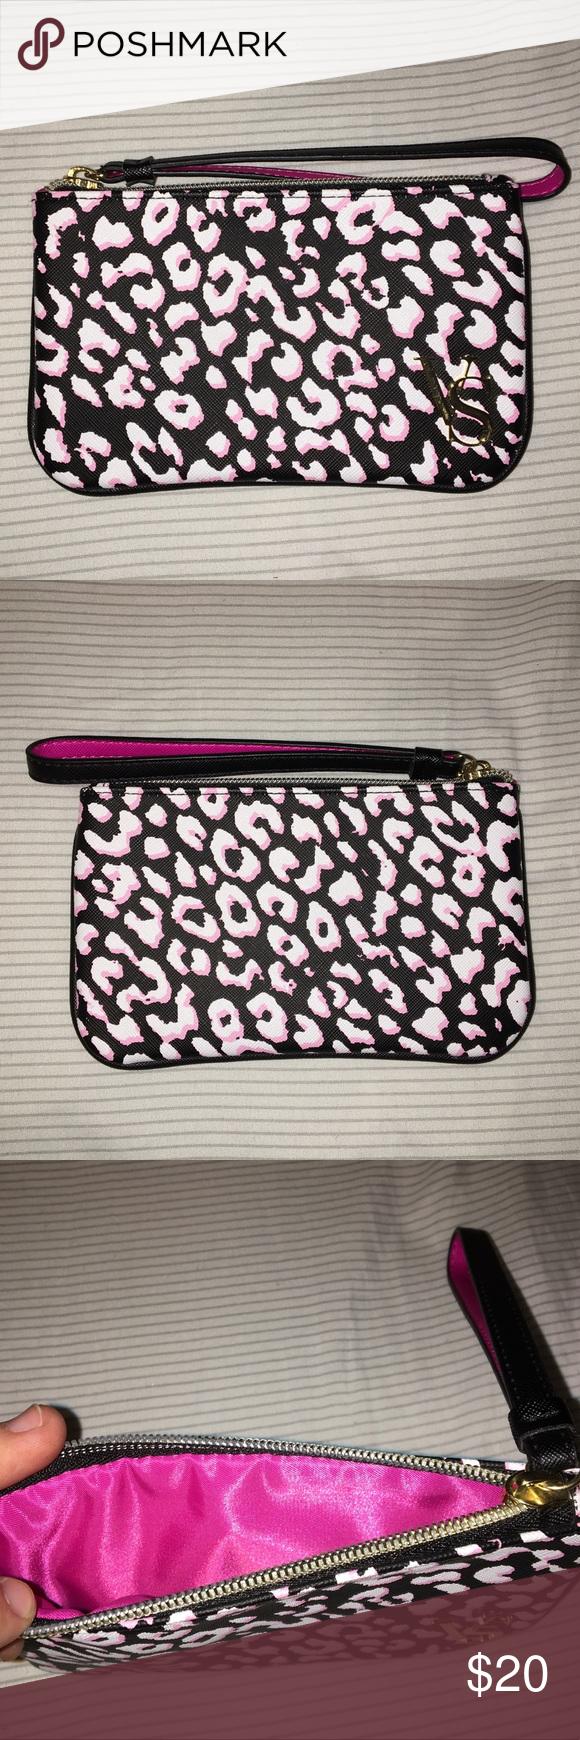 39fc184ecad NWOT victoria's secret clutch bag super cute victoria's secret pink, black,  and white clutch bag/ wallet... never used ... excellent condition :) gold  ...